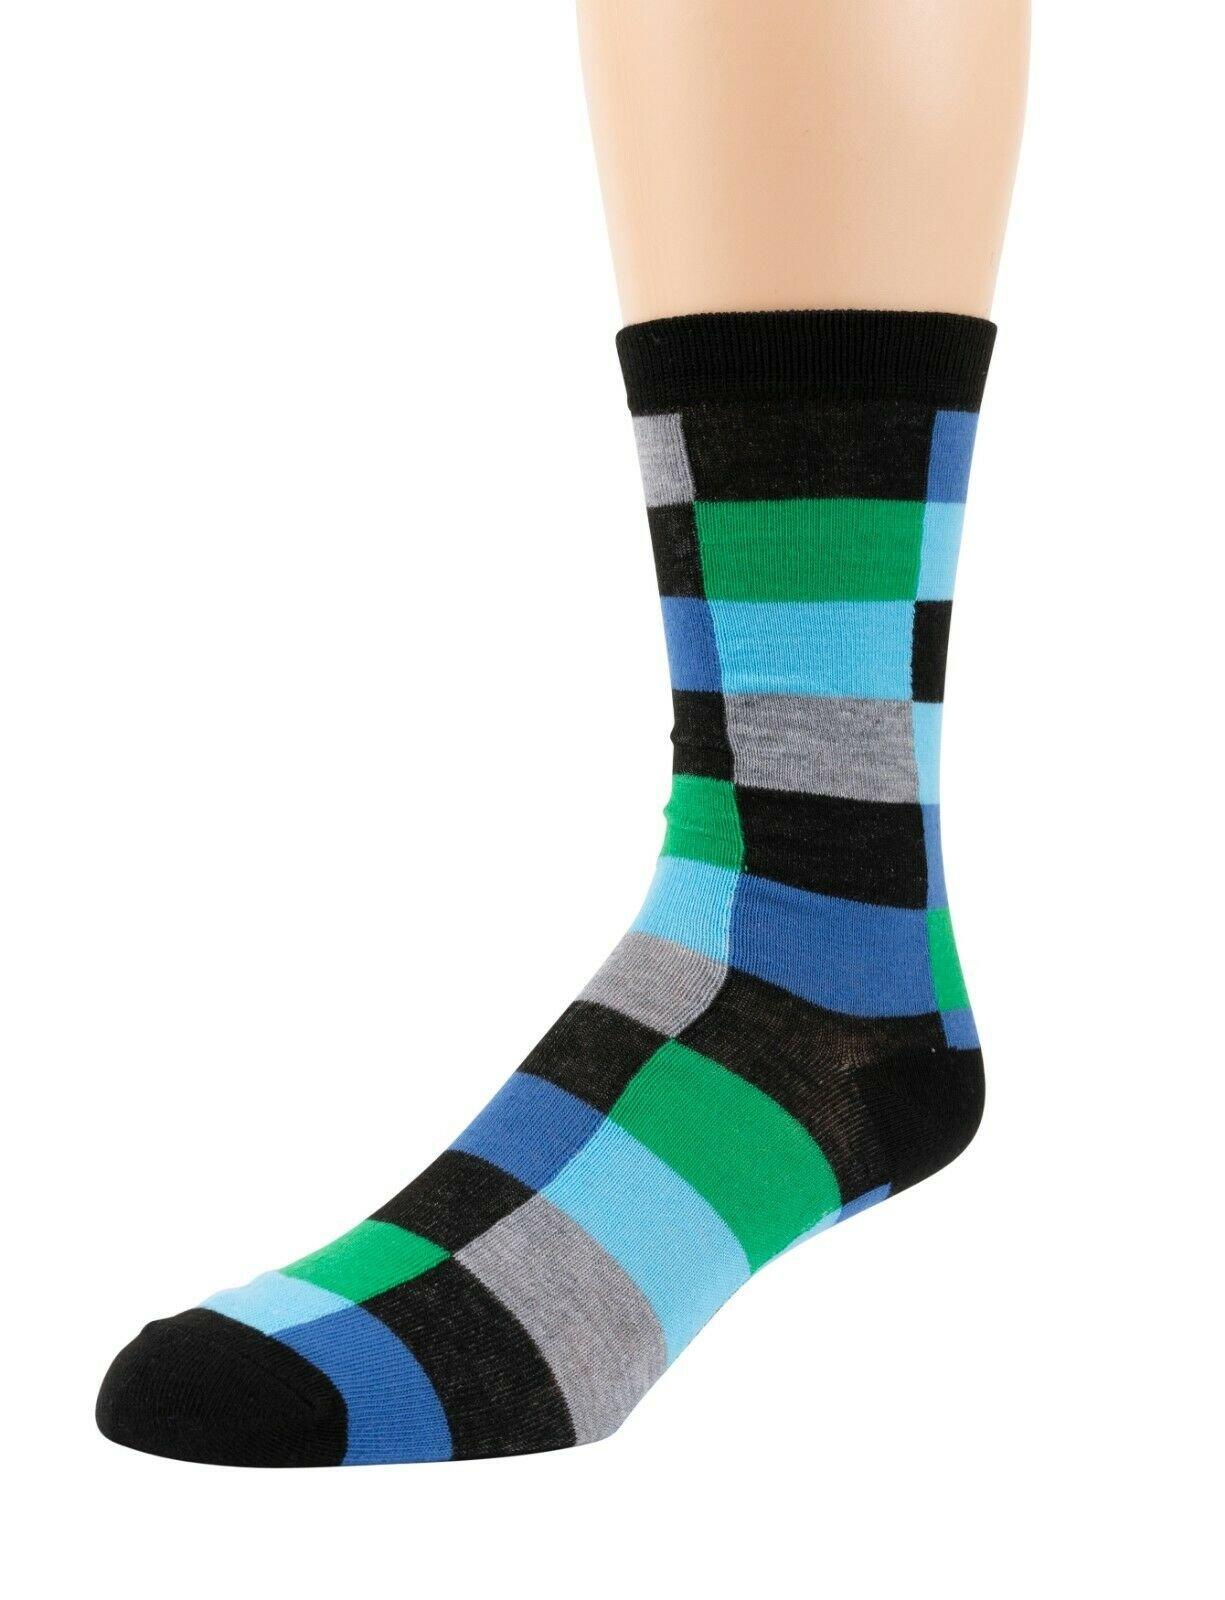 Mitch-Bogen-Mens-Cotton-Dress-Socks-Colorful-Fashion-Crew-Socks-8-Pack-Gift-Box thumbnail 49